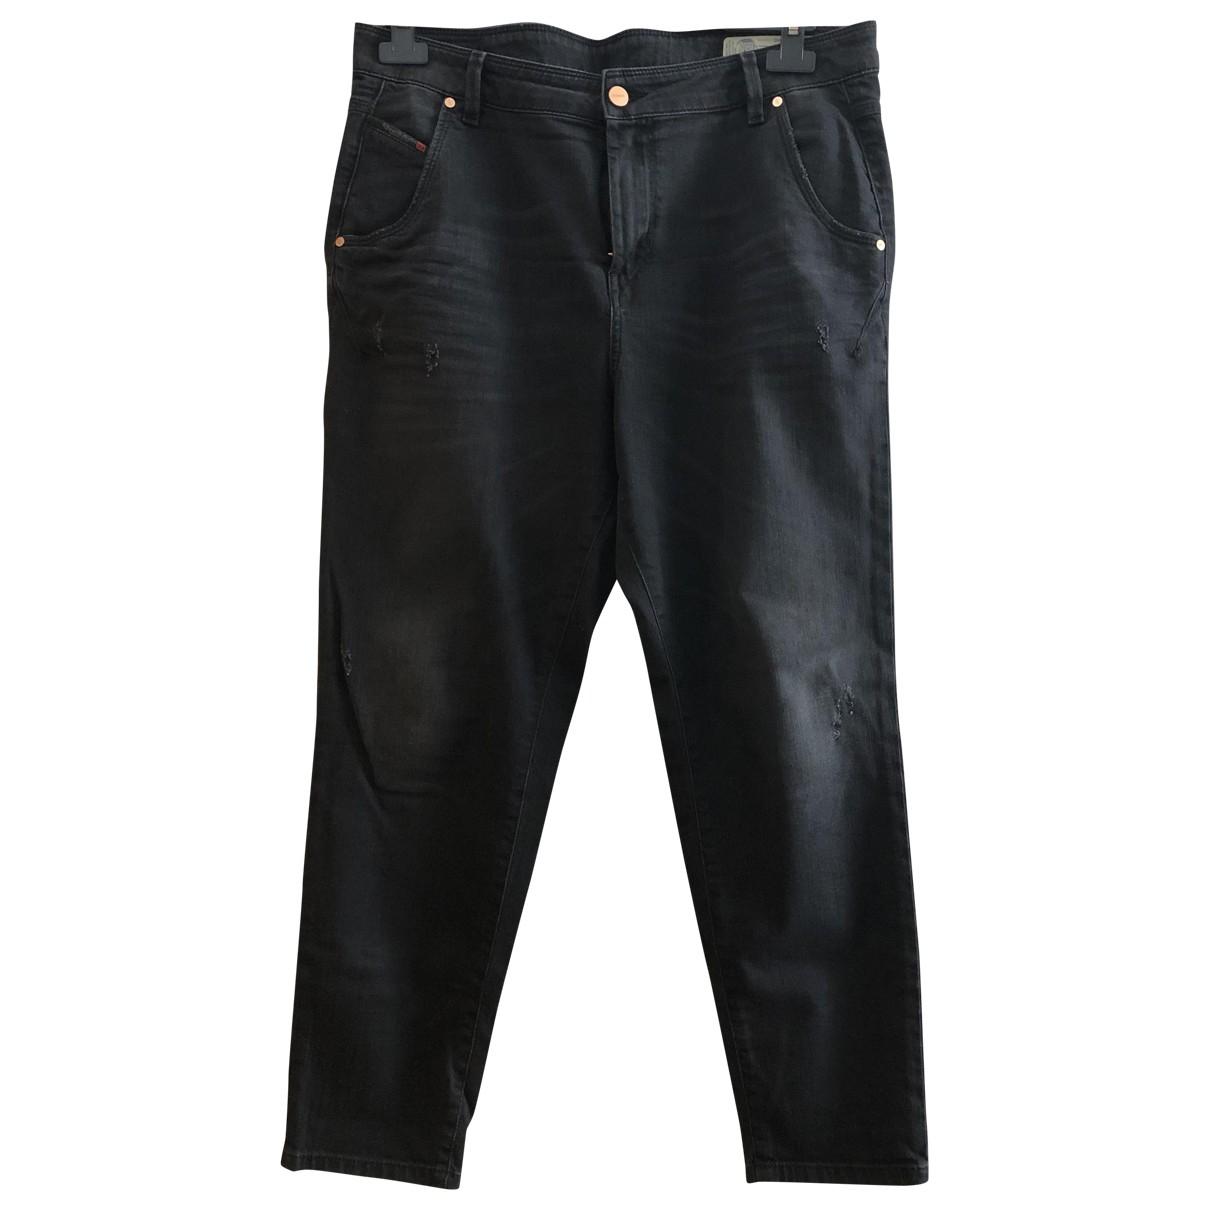 Diesel \N Black Denim - Jeans Jeans for Women 31 US